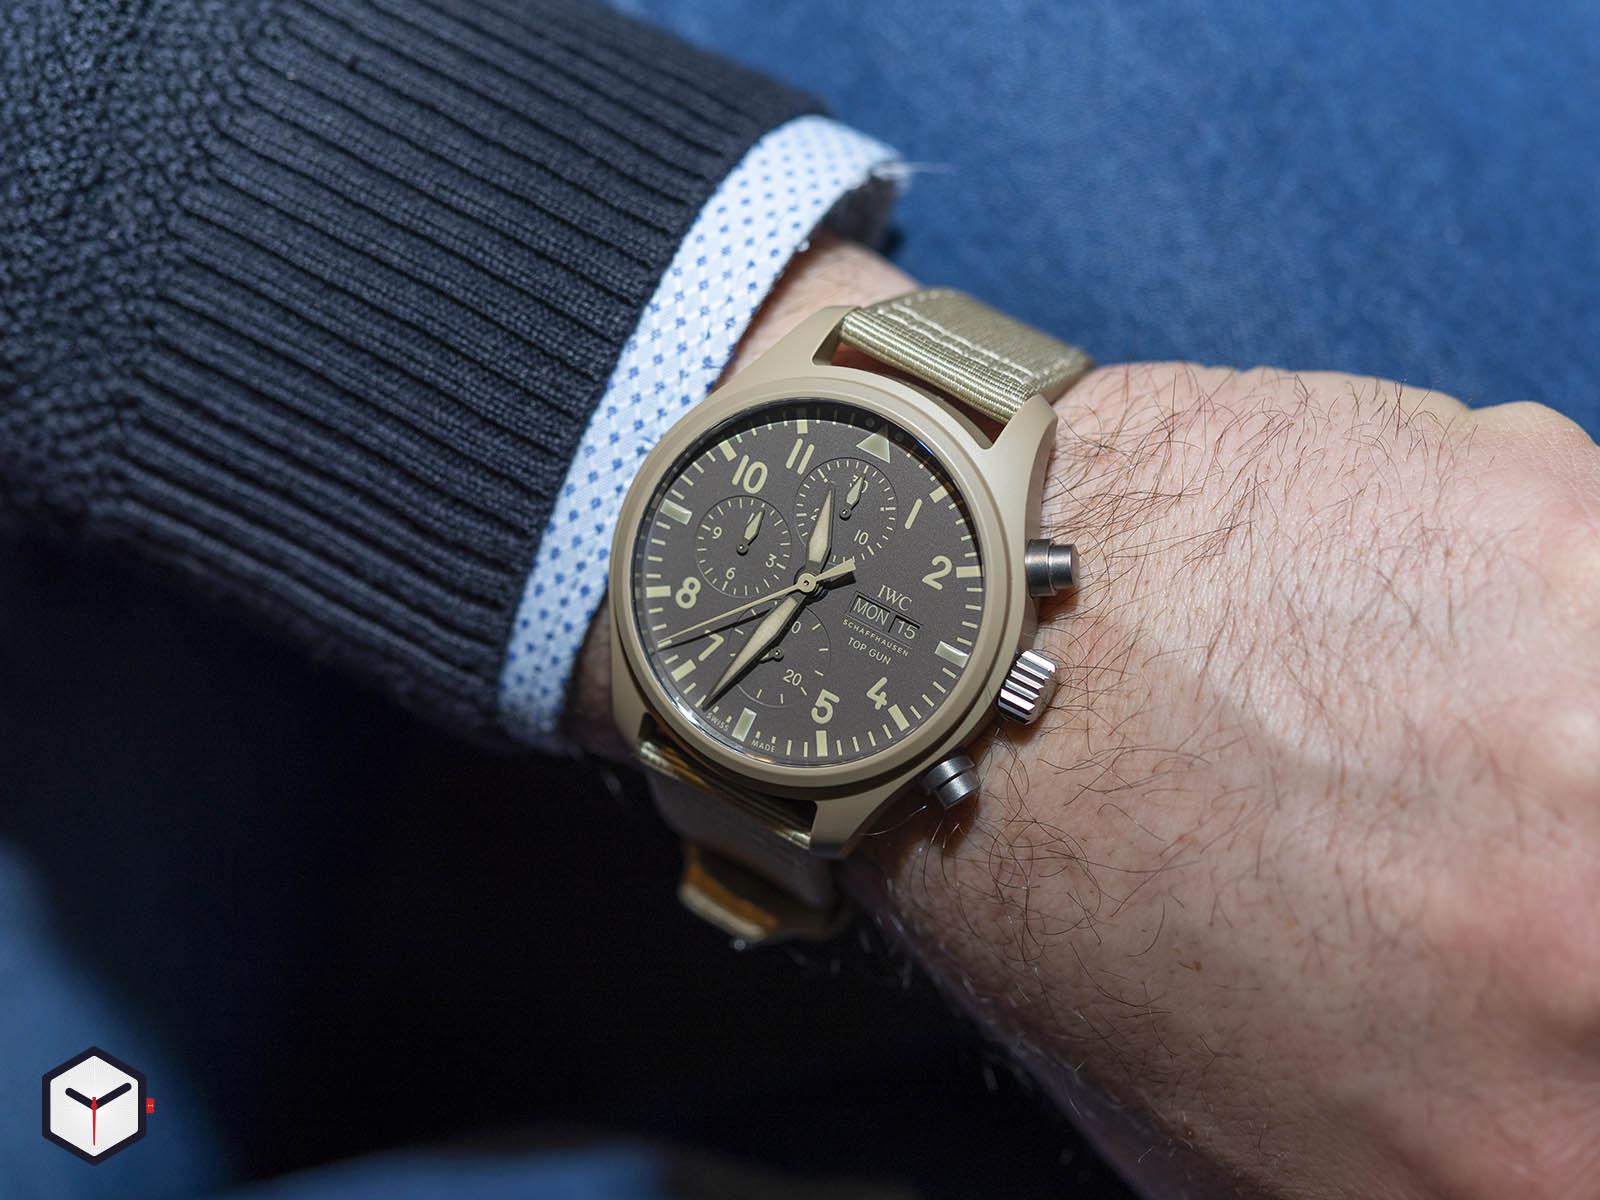 iw389103-iwc-pilot-s-watch-chronograph-top-gun-edition-mojave-desert-sihh-2019-7.jpg